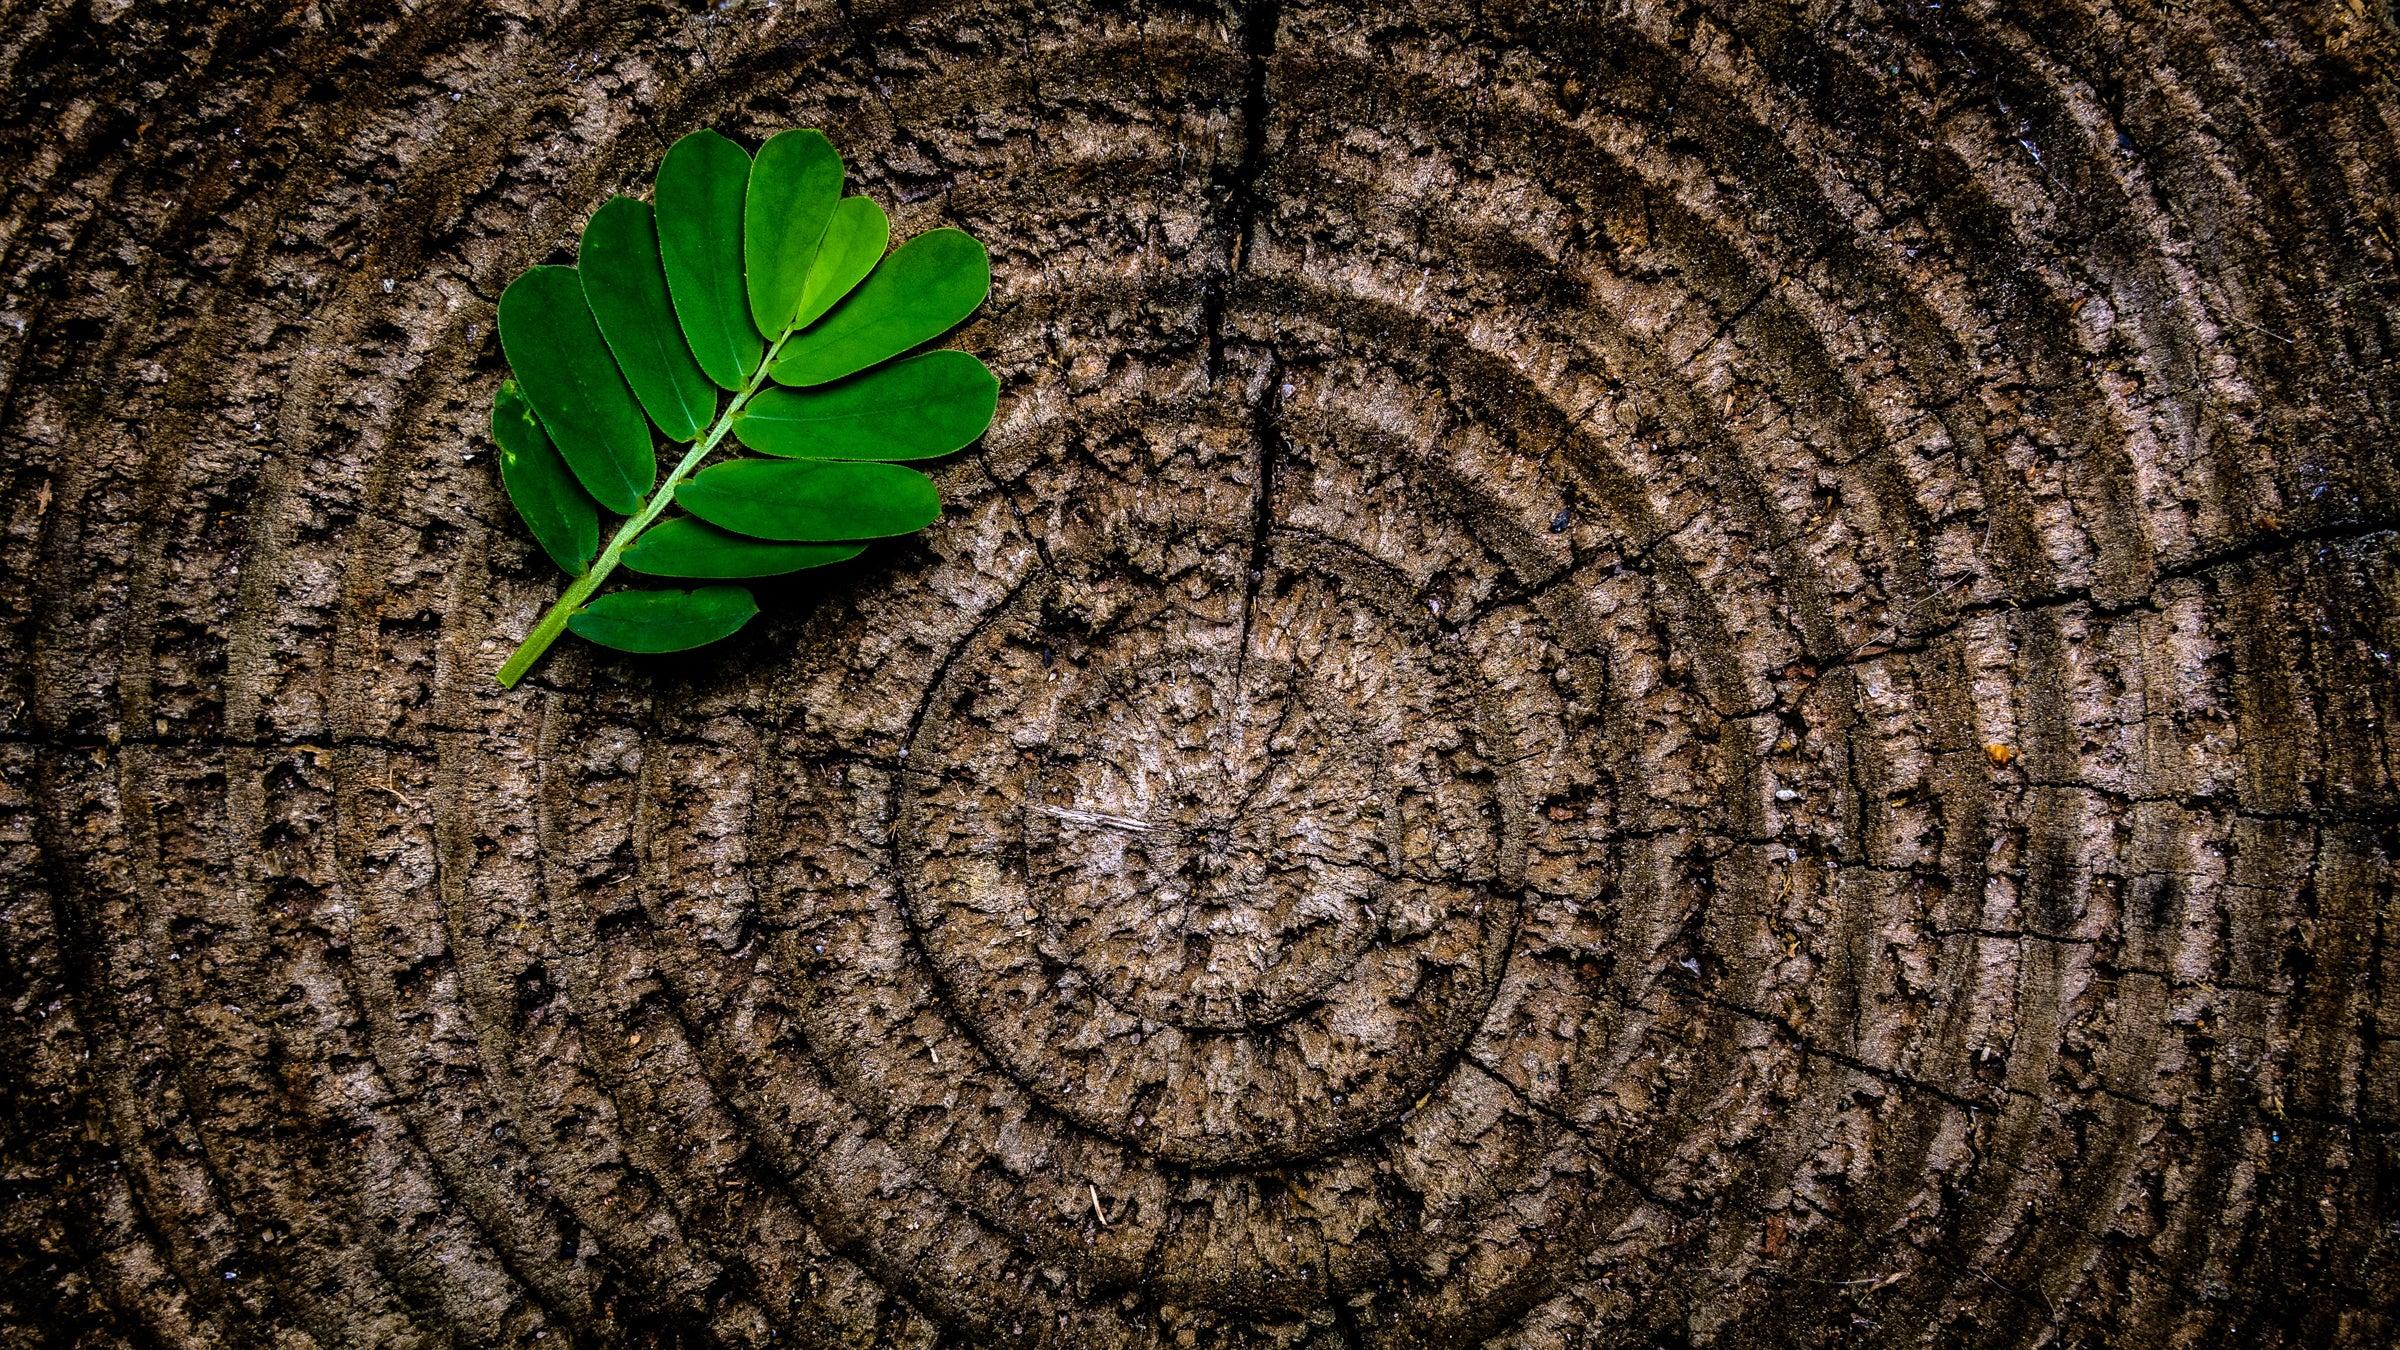 Interior of a tree stump with a fern leaf